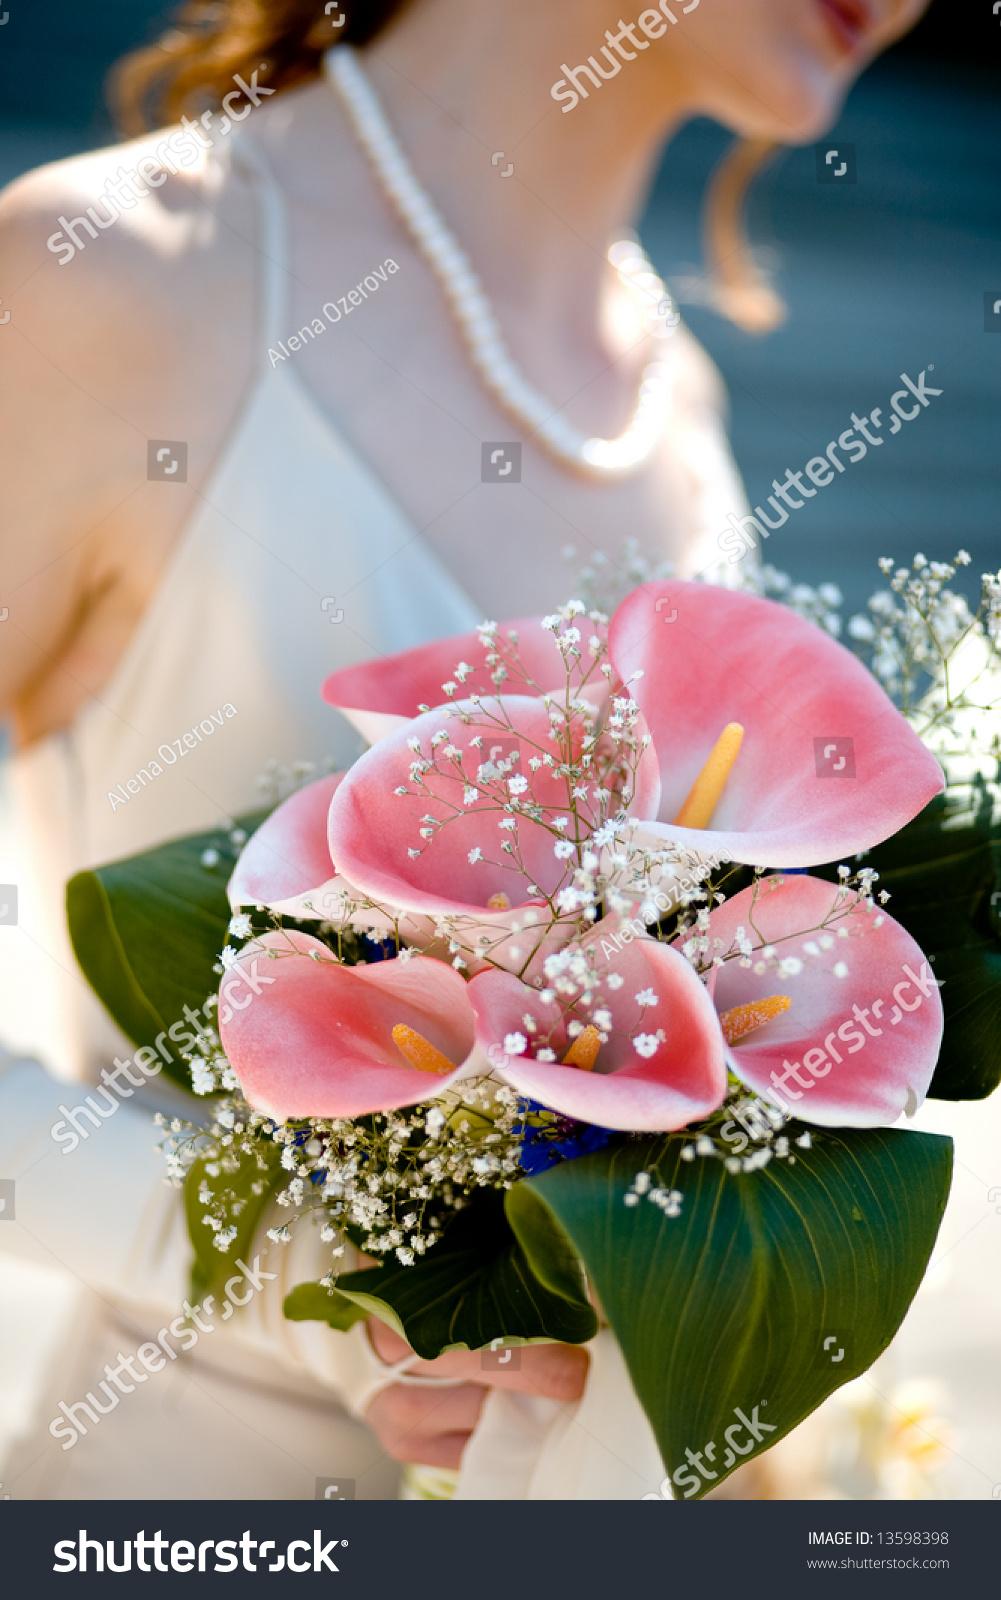 Wedding Bouquet Pink Calla Lilies Brides Stock Photo (Royalty Free ...